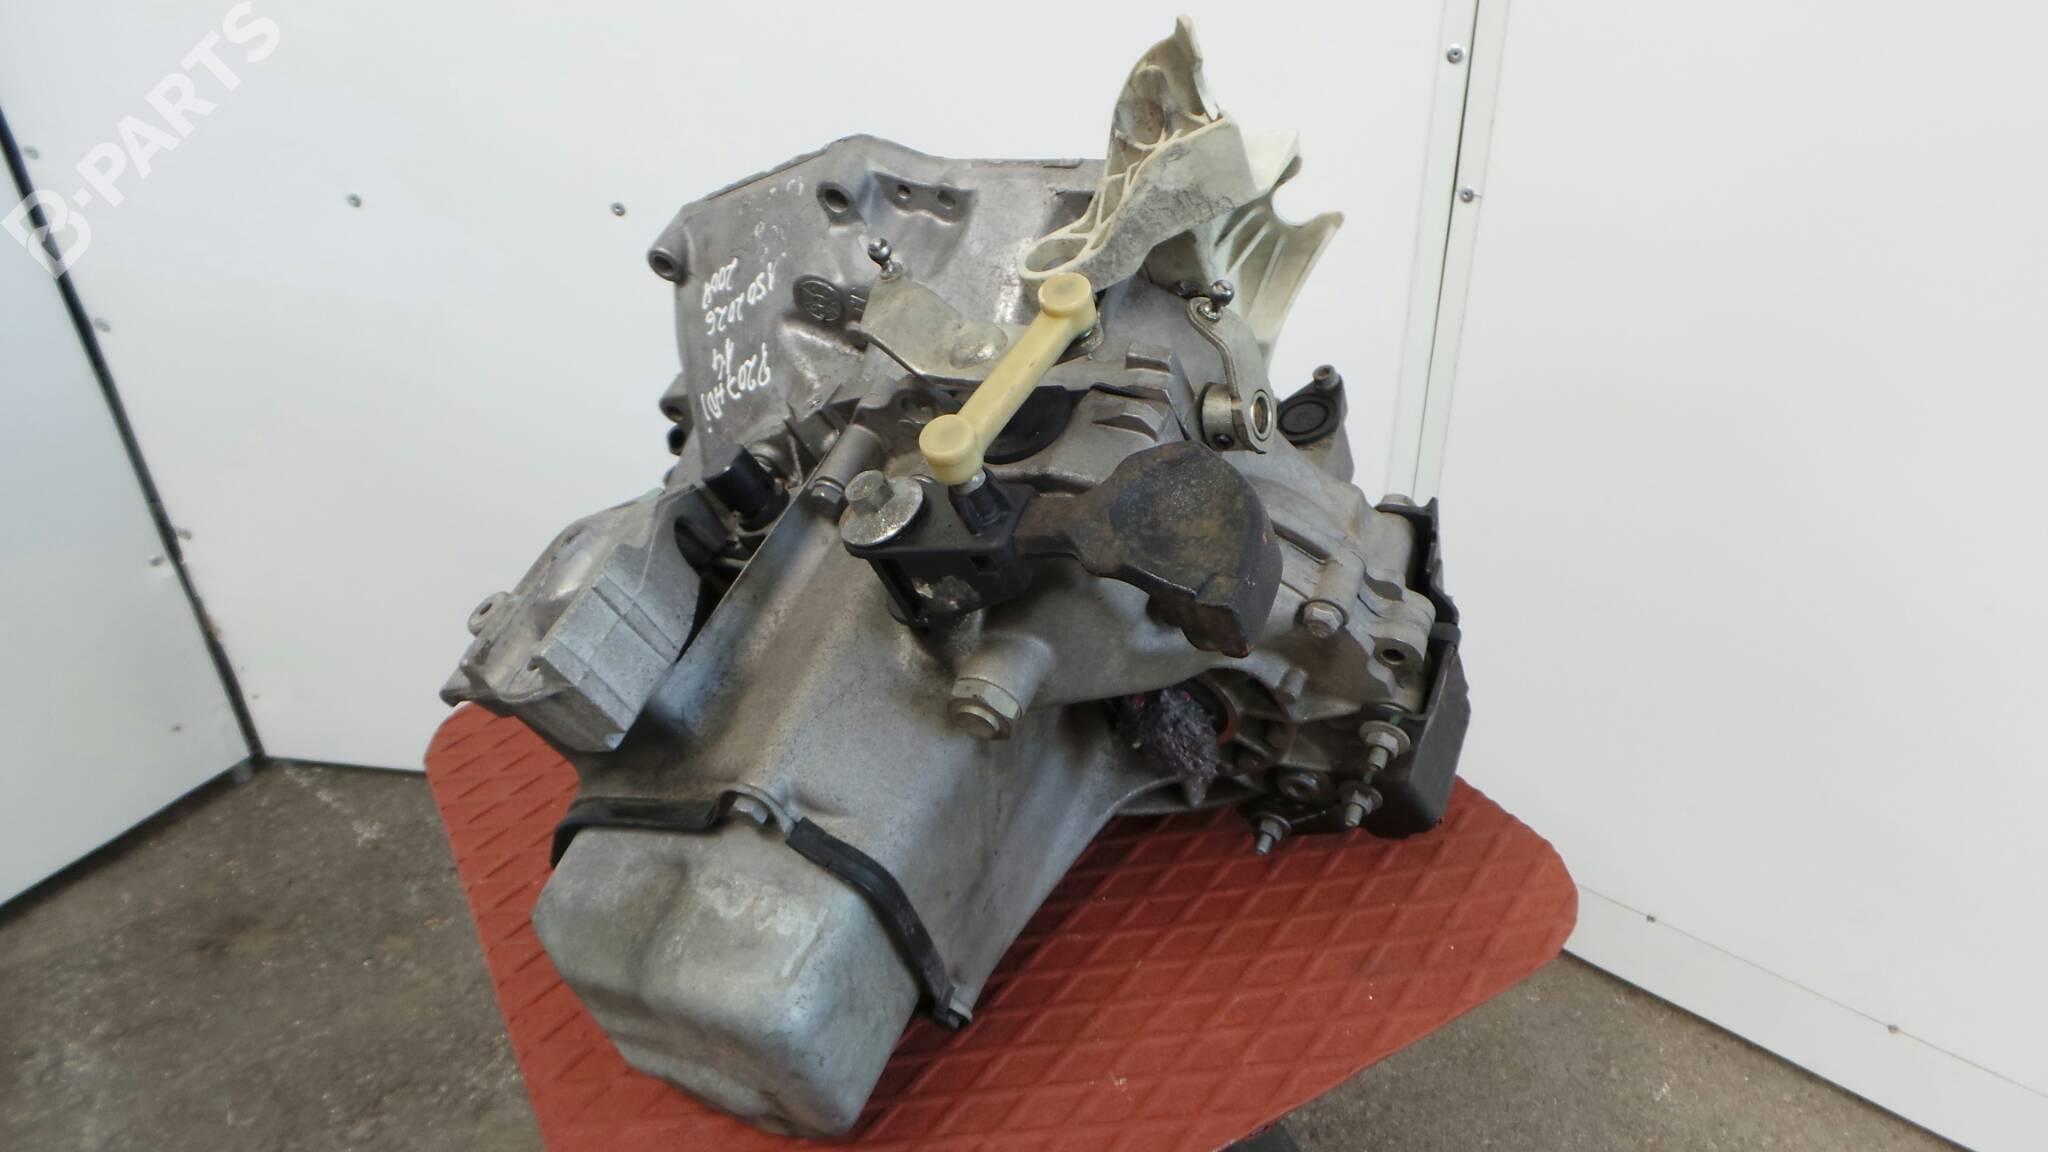 Manual Gearbox Peugeot 207 Wa Wc 14 Hdi 10908 Fuse Box Water 20cq55 68hp